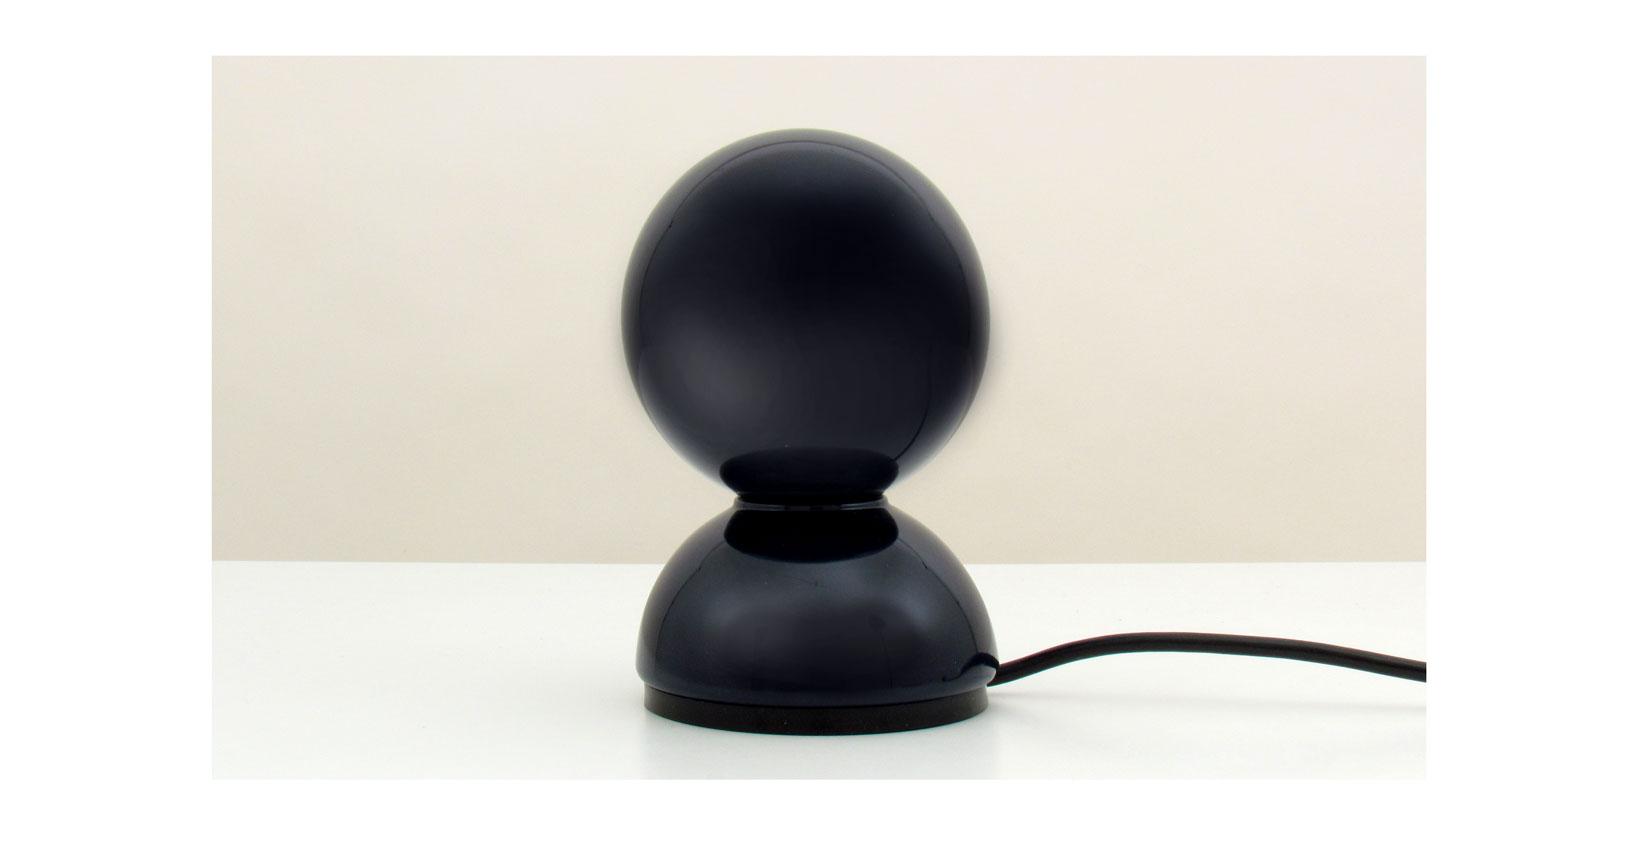 eclisse lamp vintage furniture iconic design lighting lampada